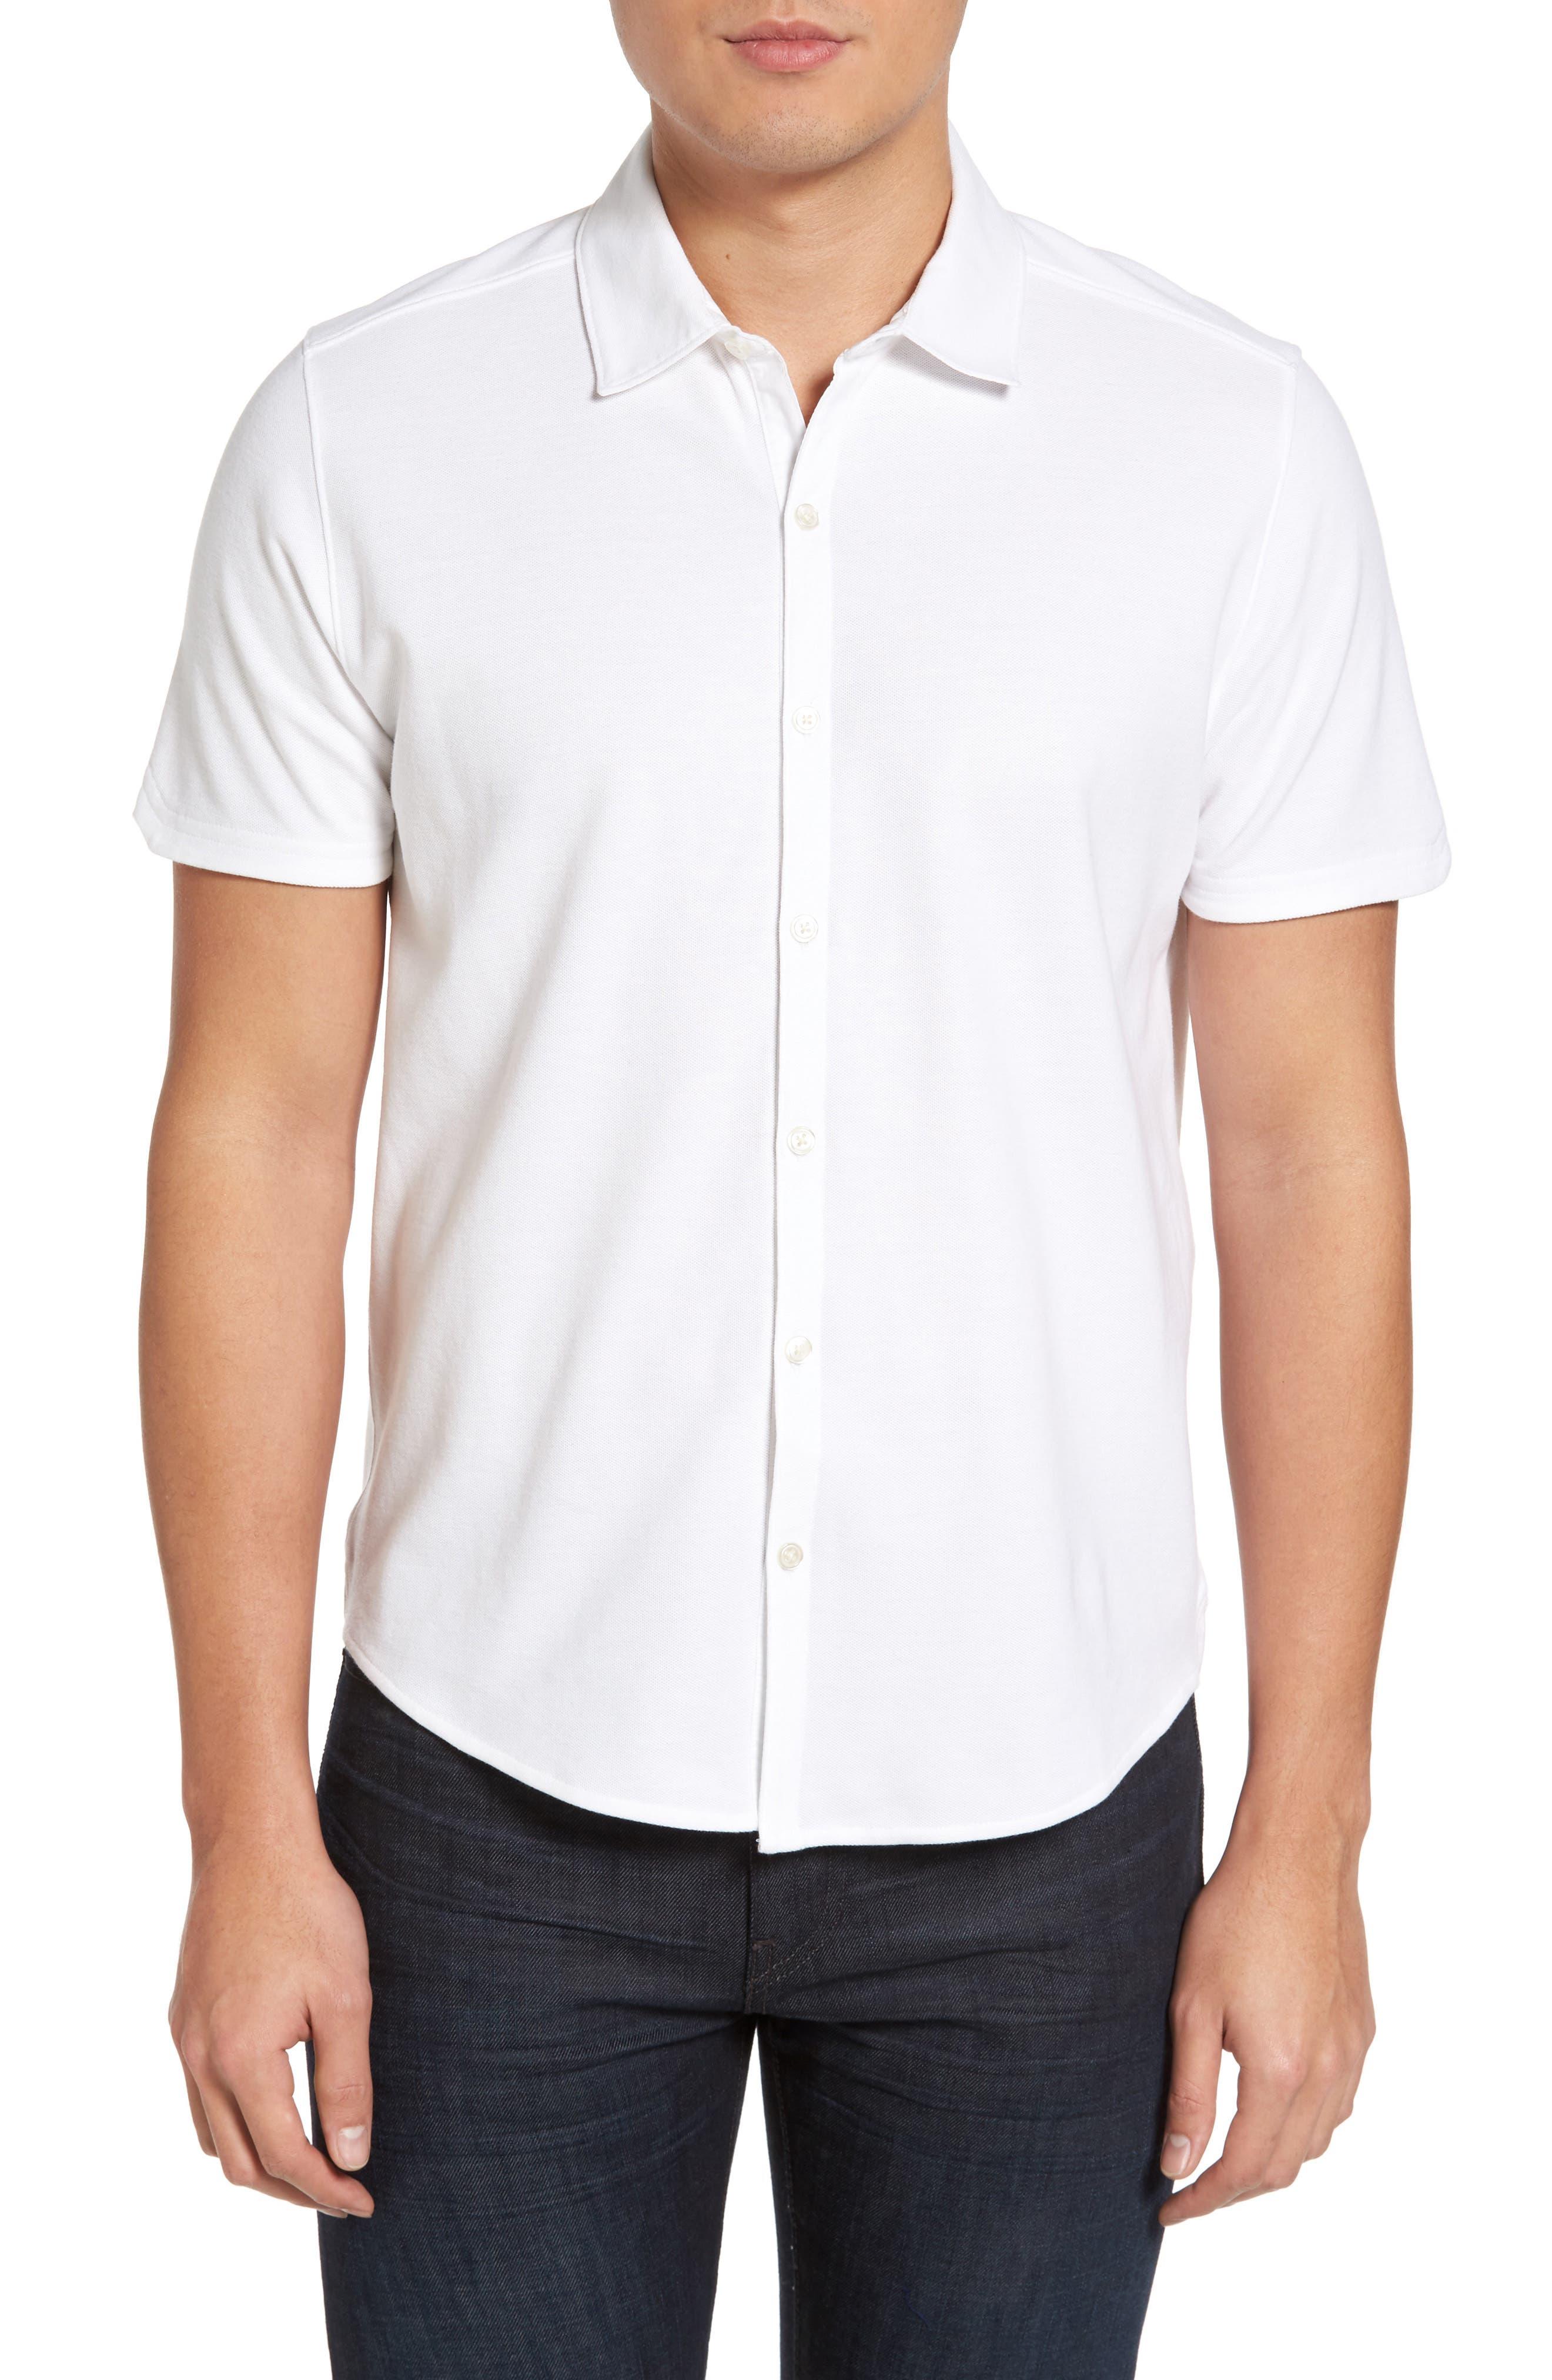 Palmetto Pima Cotton Shirt,                             Main thumbnail 1, color,                             White